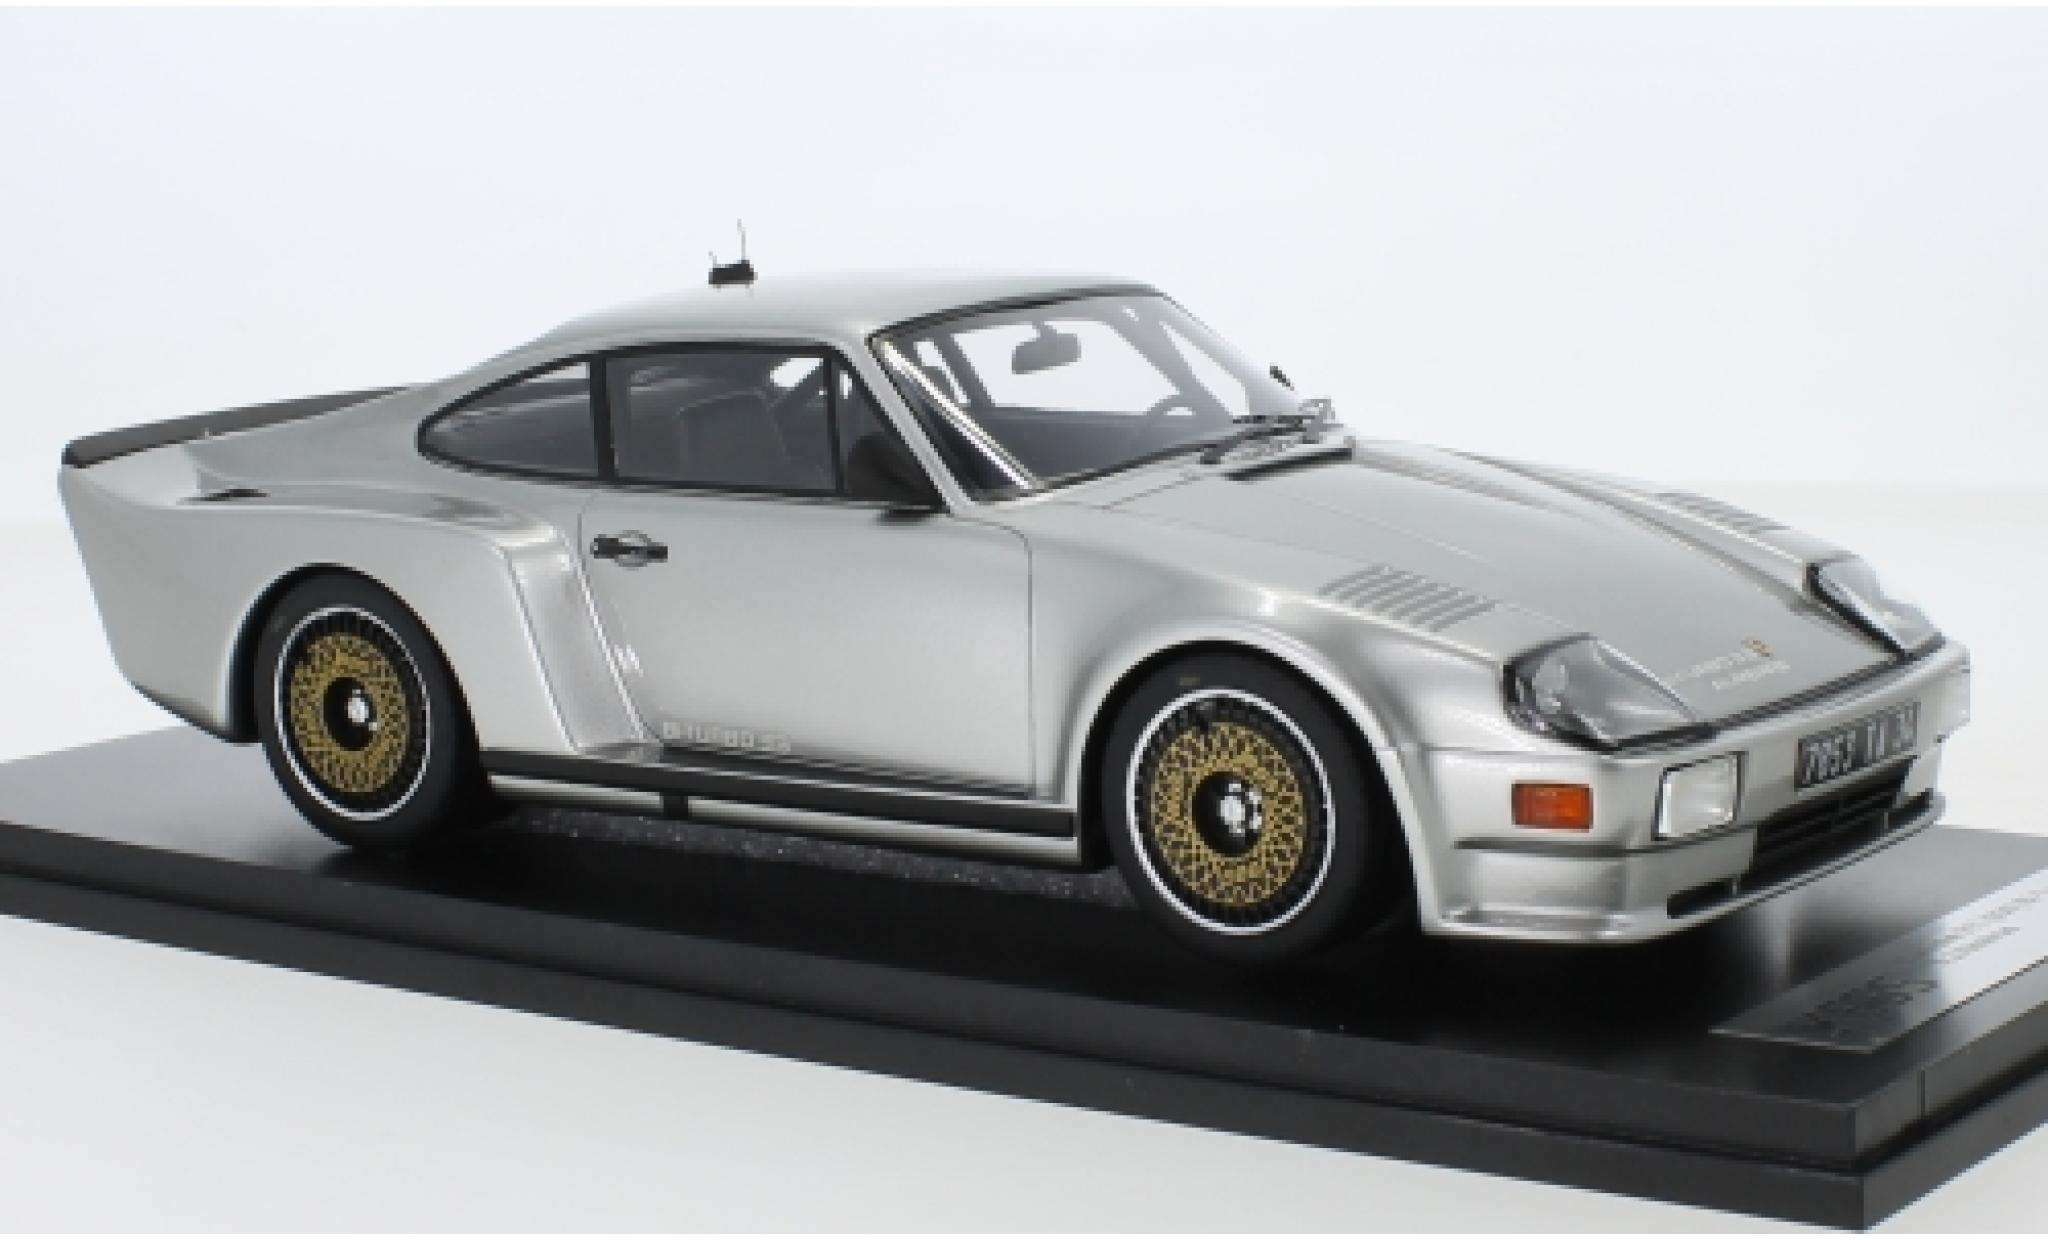 Porsche 993 Turbo 1/18 Kess 911 (930) Biturbo 3.3 Almeras grise 1